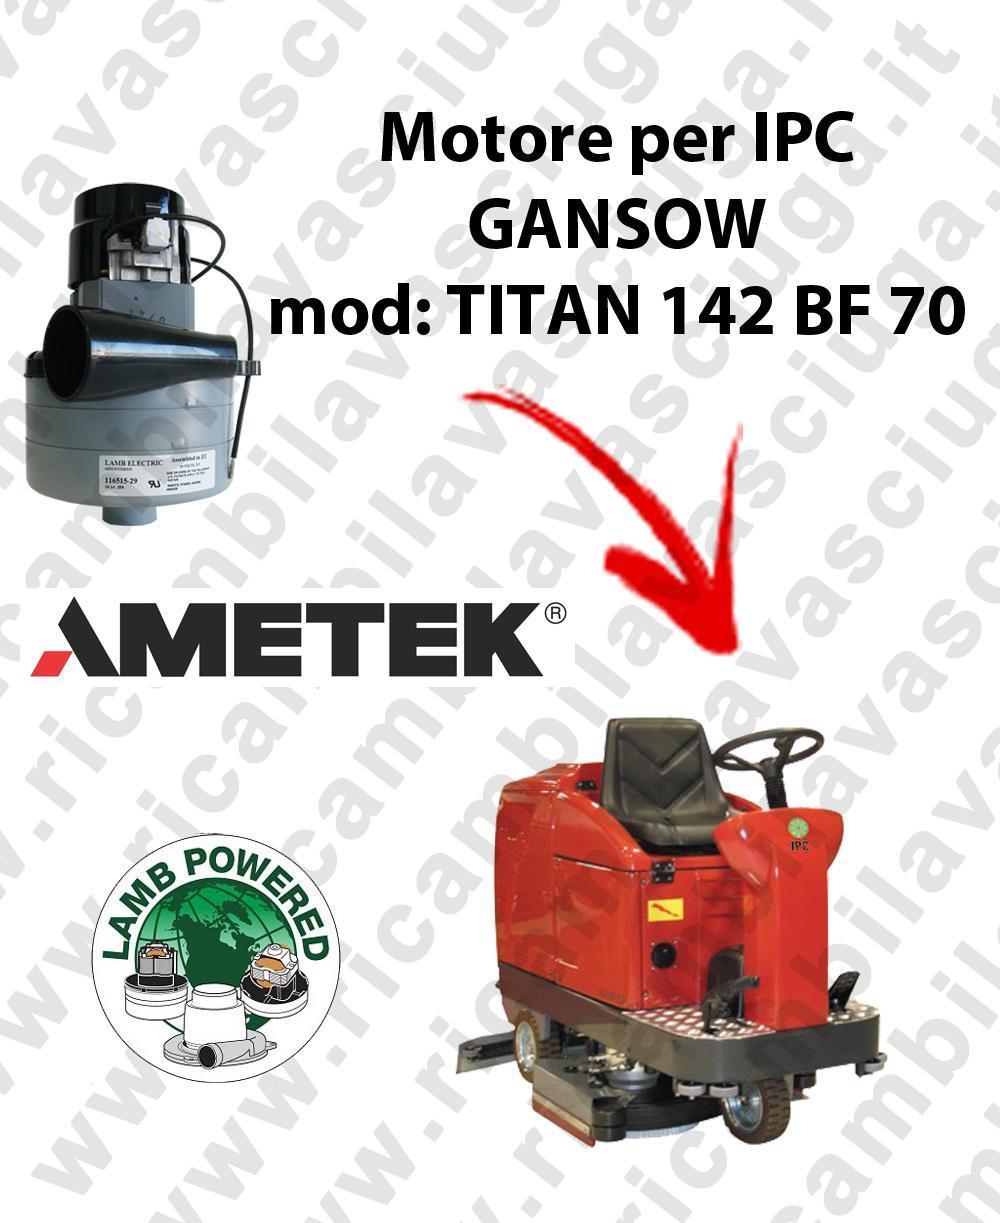 TITAN 142 BF 70 Saugmotor LAMB AMETEK für scheuersaugmaschinen IPC GANSOW